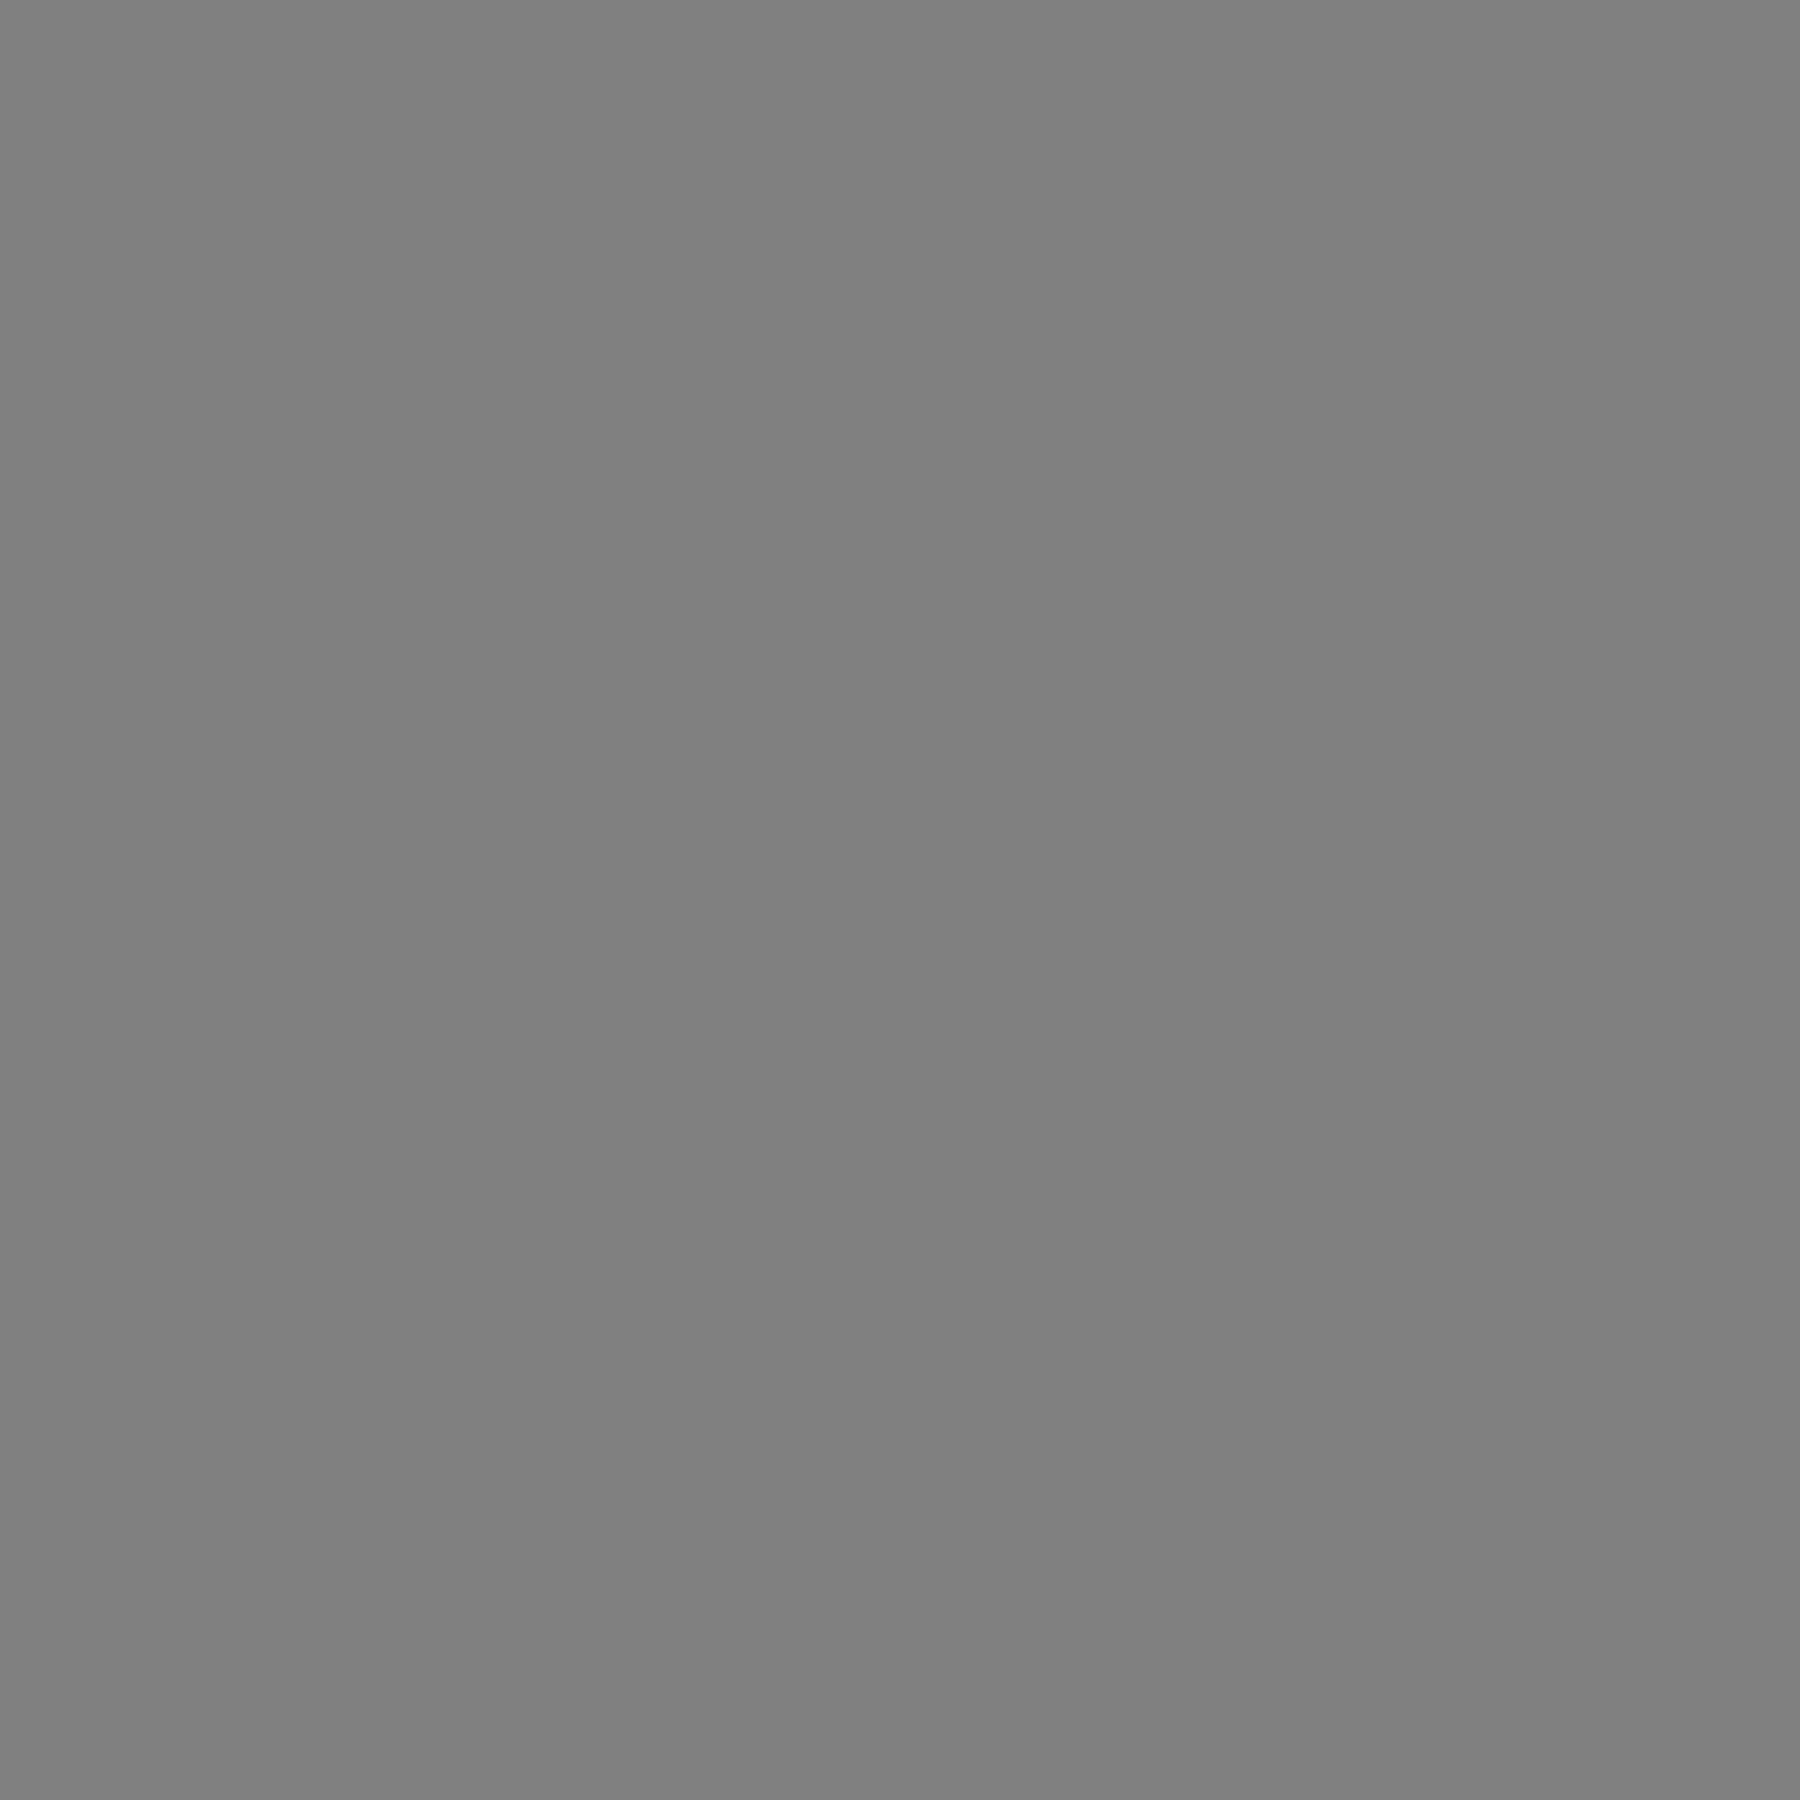 portait placeholder 6.jpg